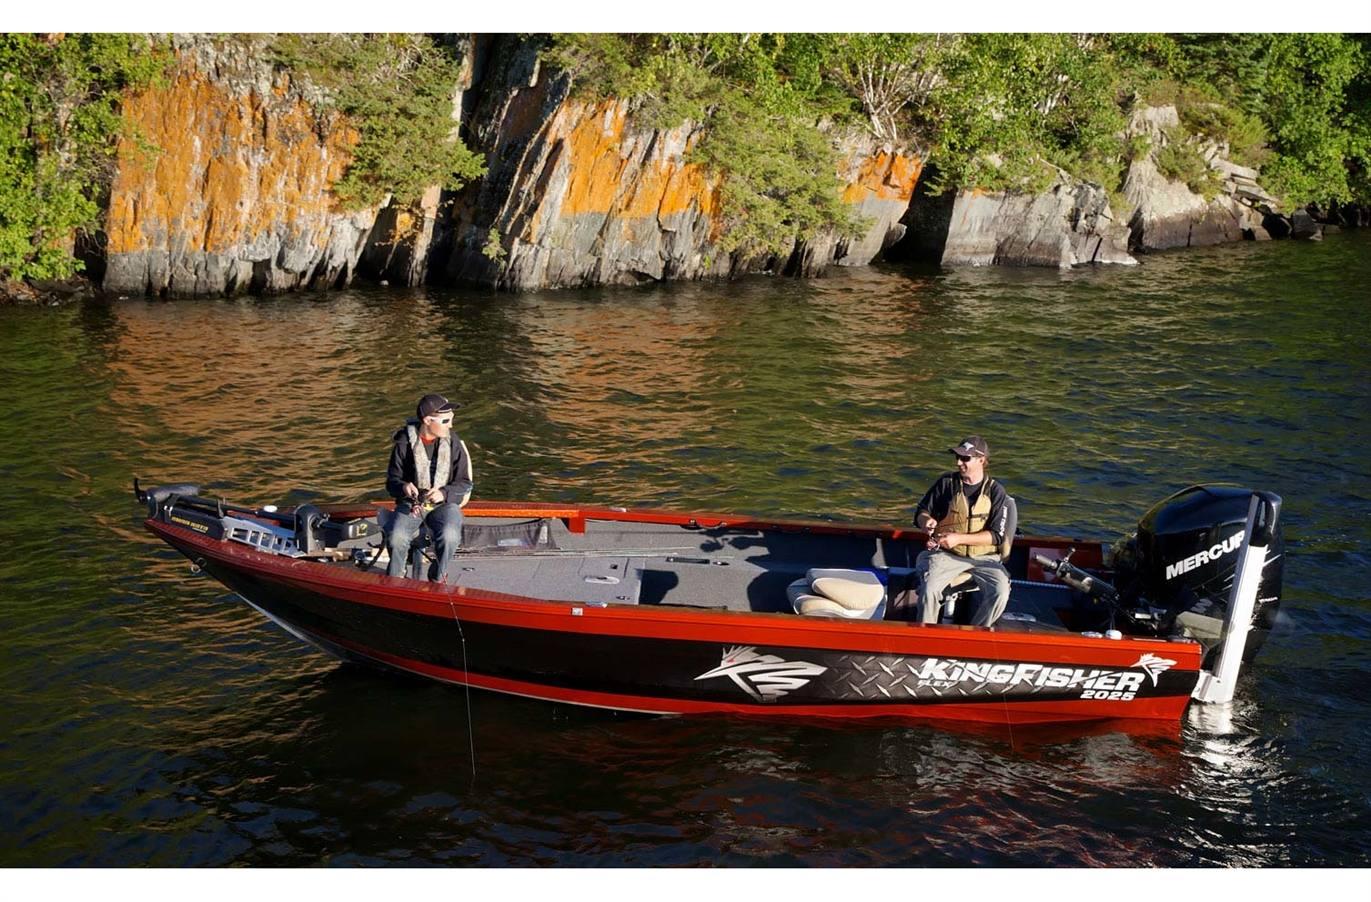 2019 Kingfisher Boats 2025 Flex Tiller for sale in Delano, MN